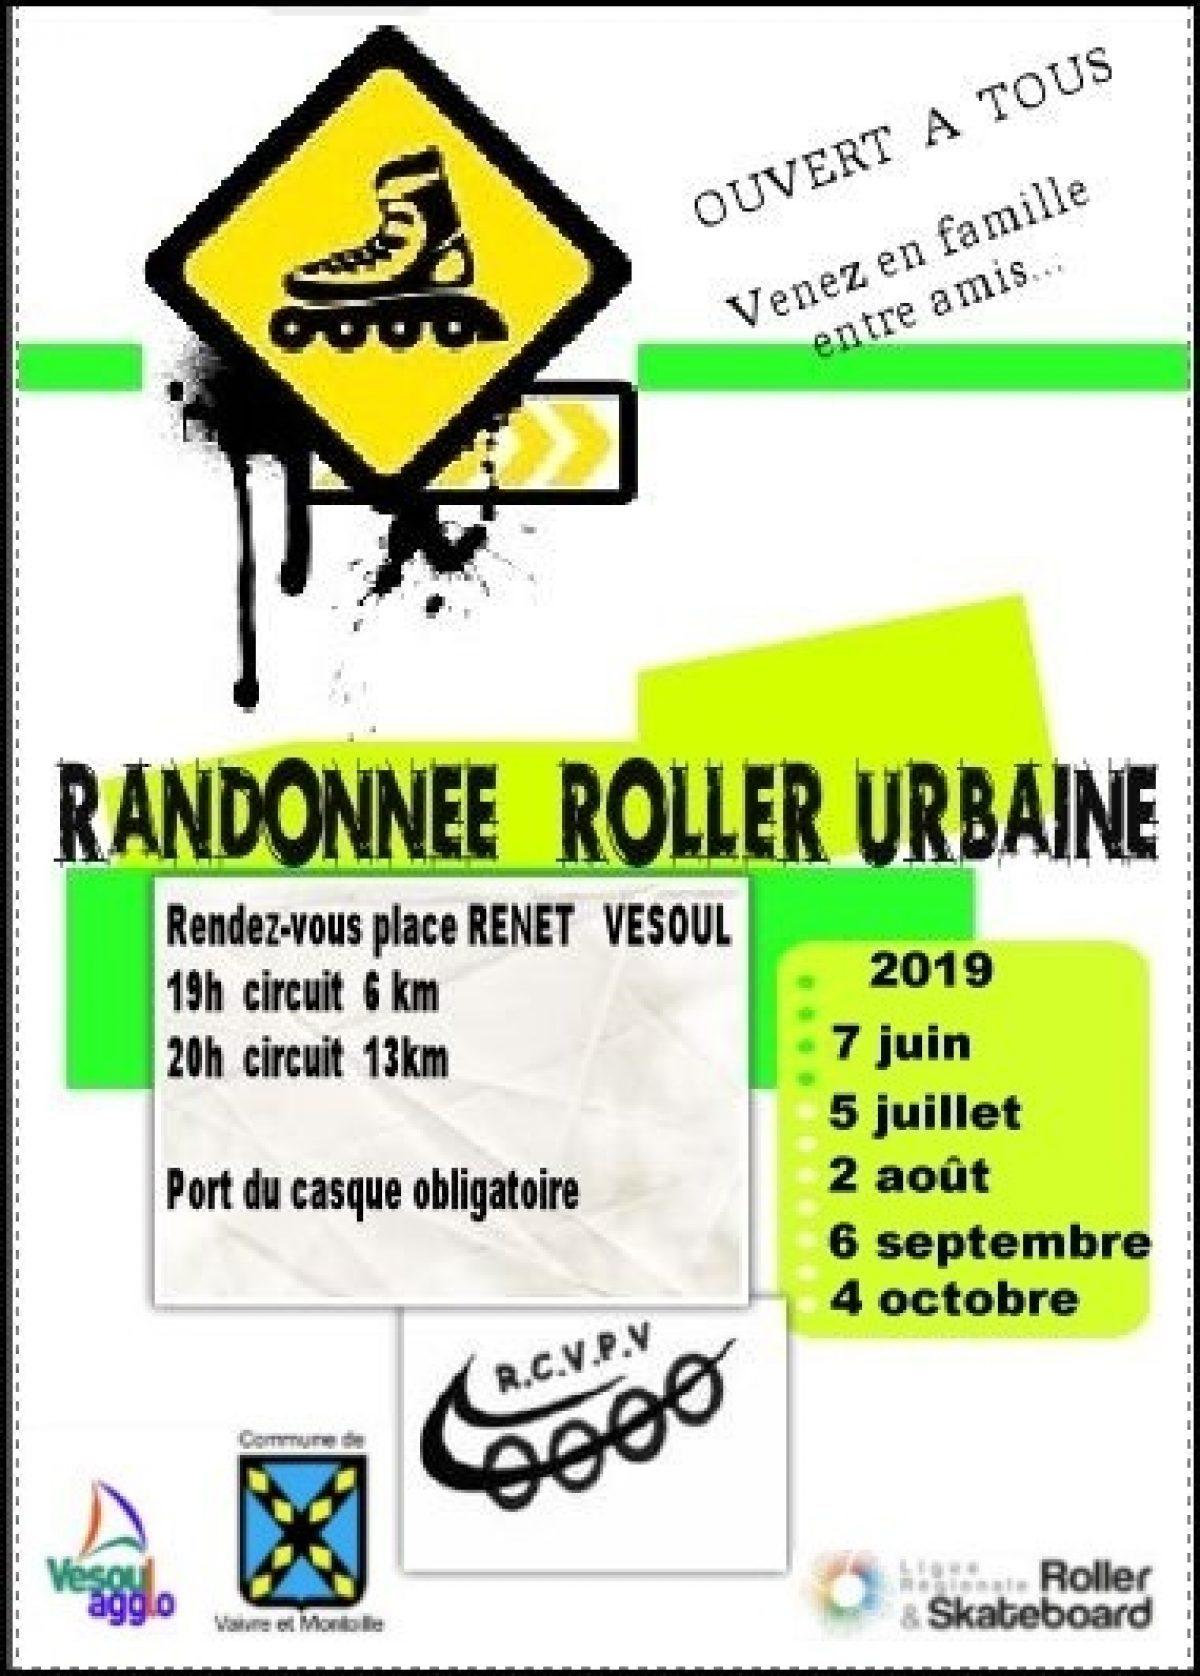 Dernière rando urbaine le vendredi 4 octobre 2019 !!!!